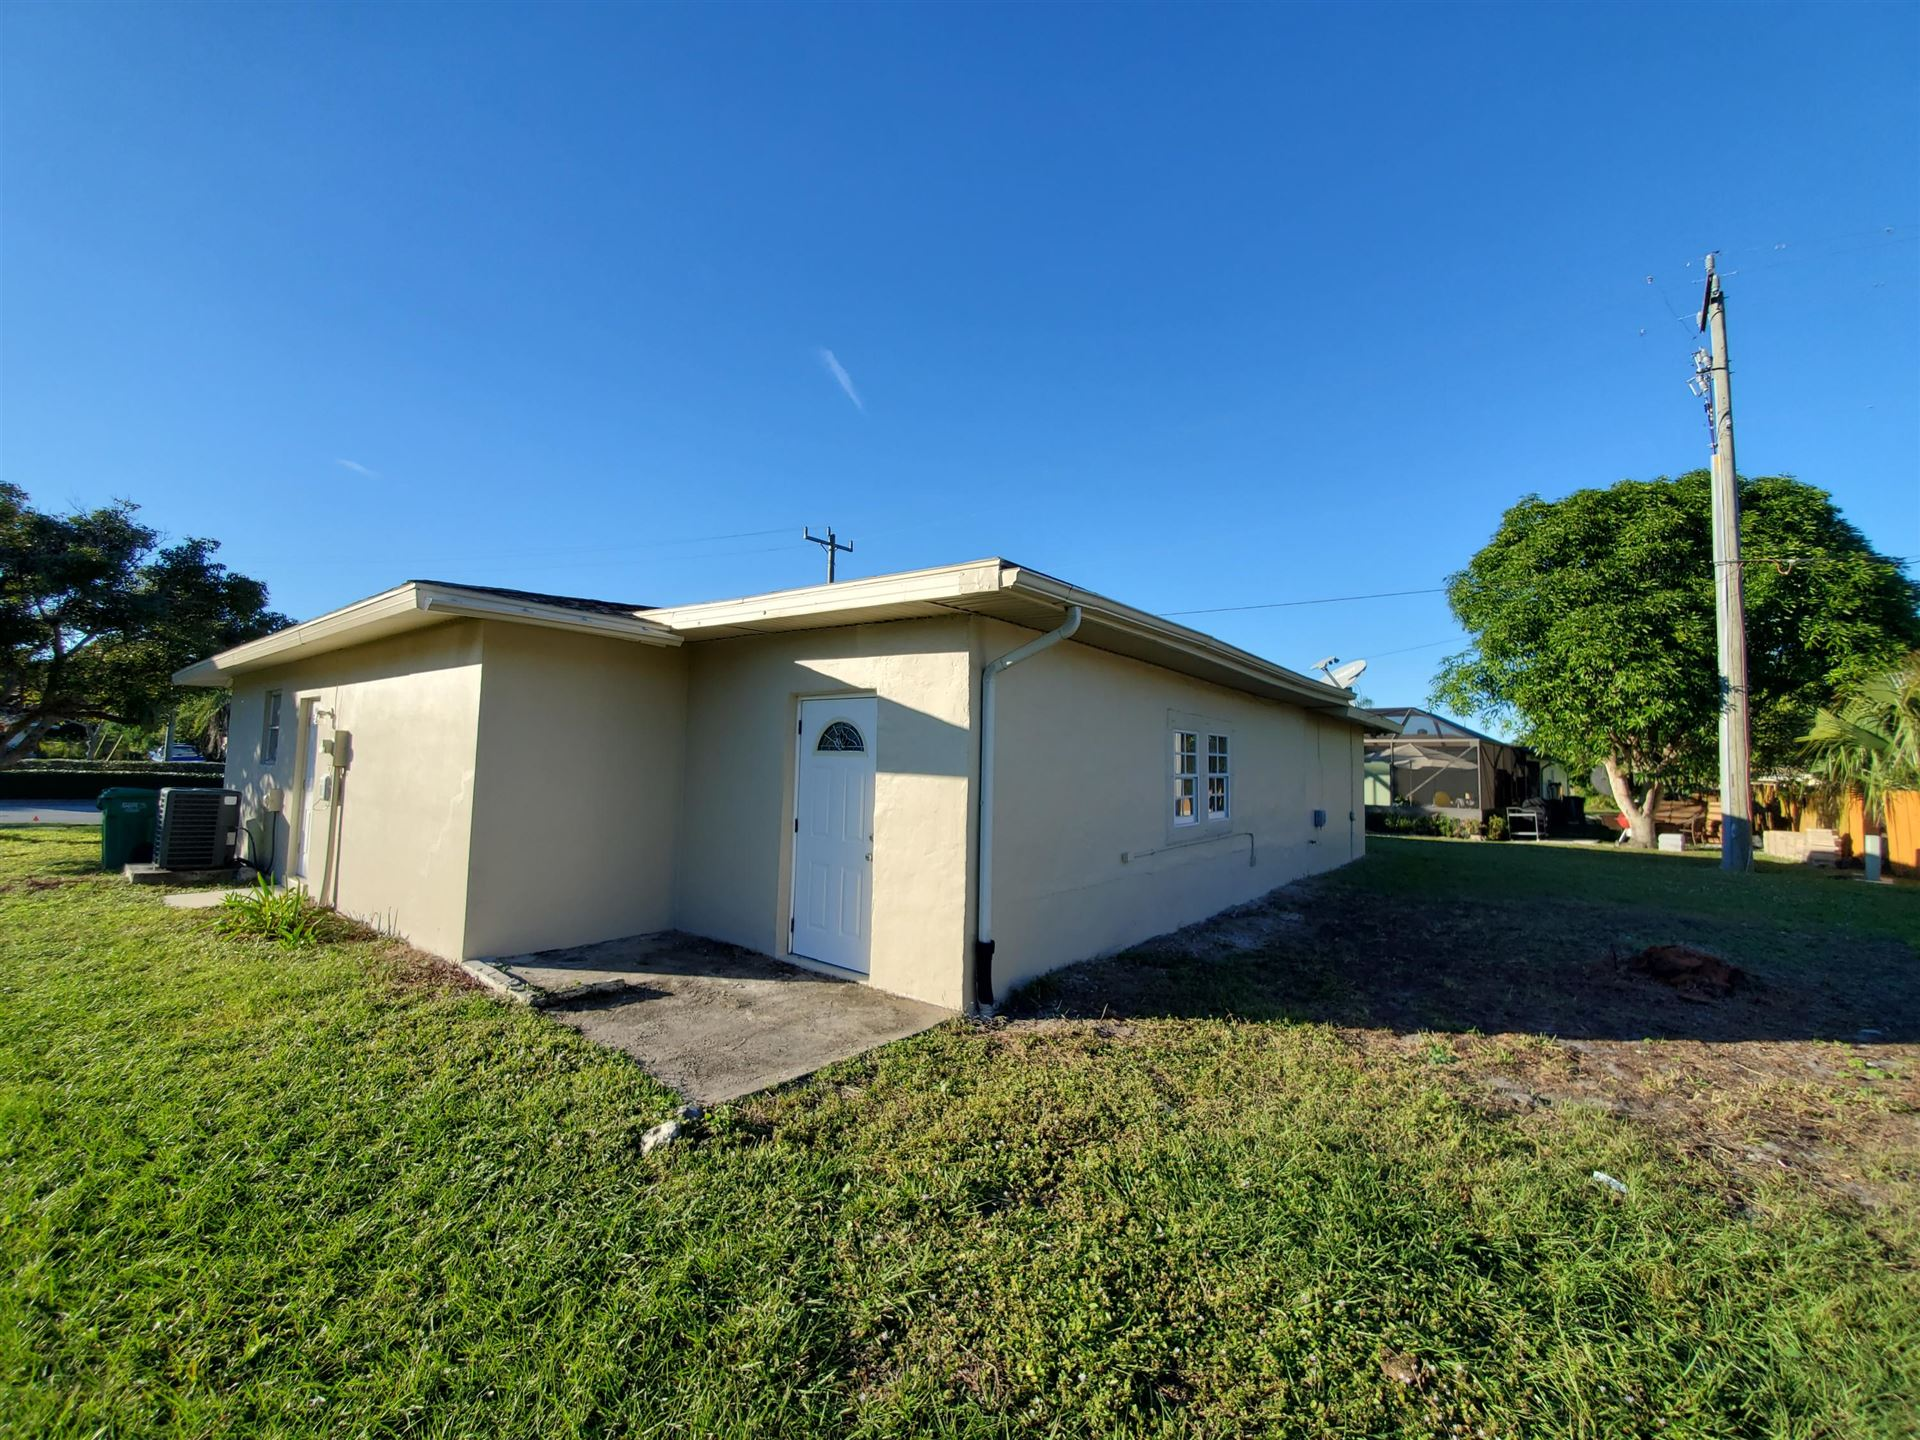 Photo of 153 NE Airoso Boulevard, Port Saint Lucie, FL 34986 (MLS # RX-10685804)